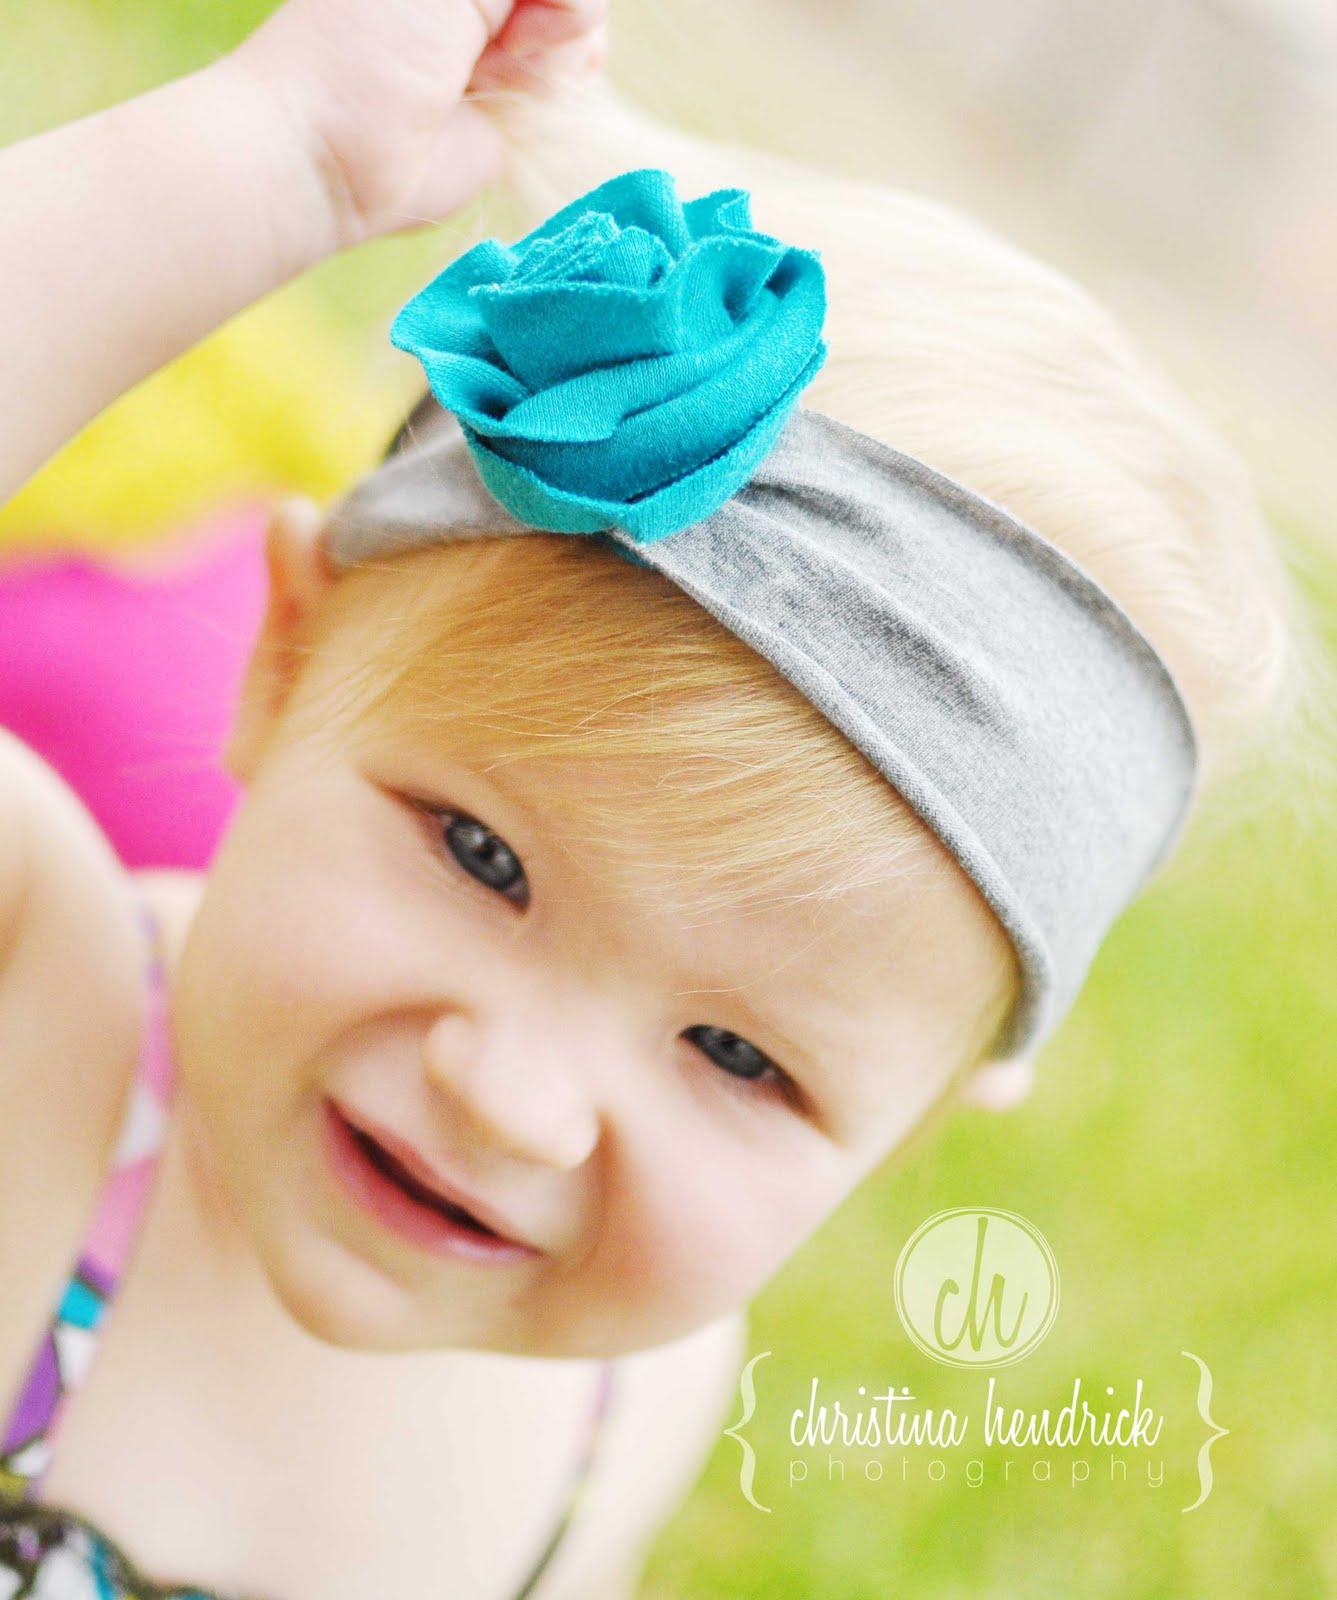 http://4.bp.blogspot.com/-OvmoiysxzrU/Tbnbz9vAacI/AAAAAAAACI0/mEQqmCCm3Po/s1600/adam%2527s+blankie+turquoise+jersey+knit+rosette+headband+for+baby+girl+%25282%2529.jpg